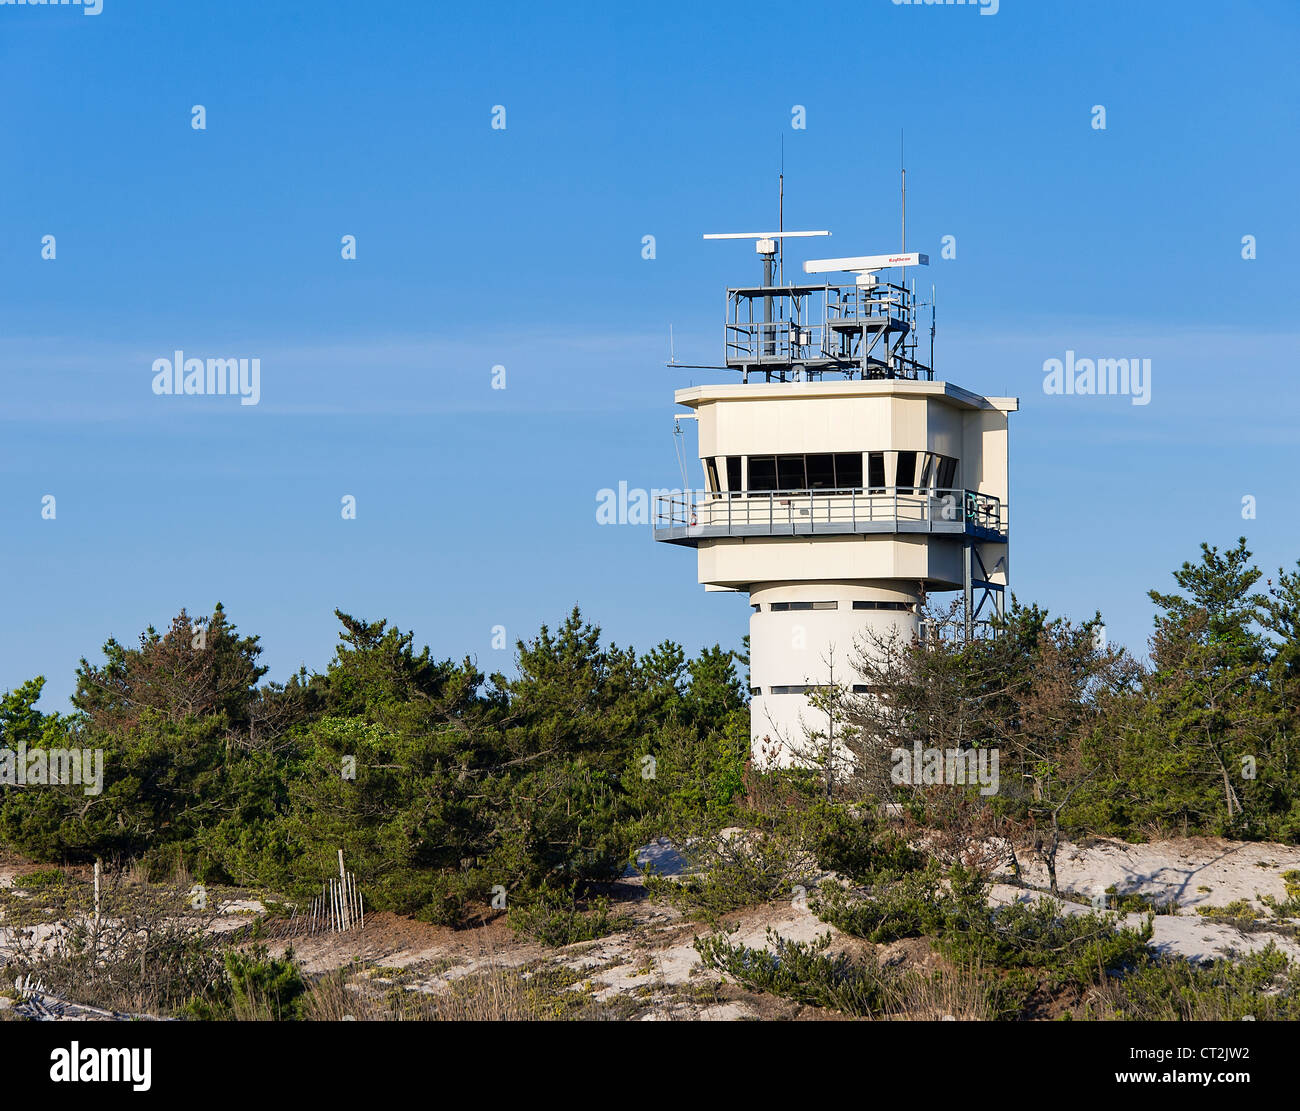 Pilot Radar Tower at Cape Henlopen State Park, Lewes, Delaware - Stock Image